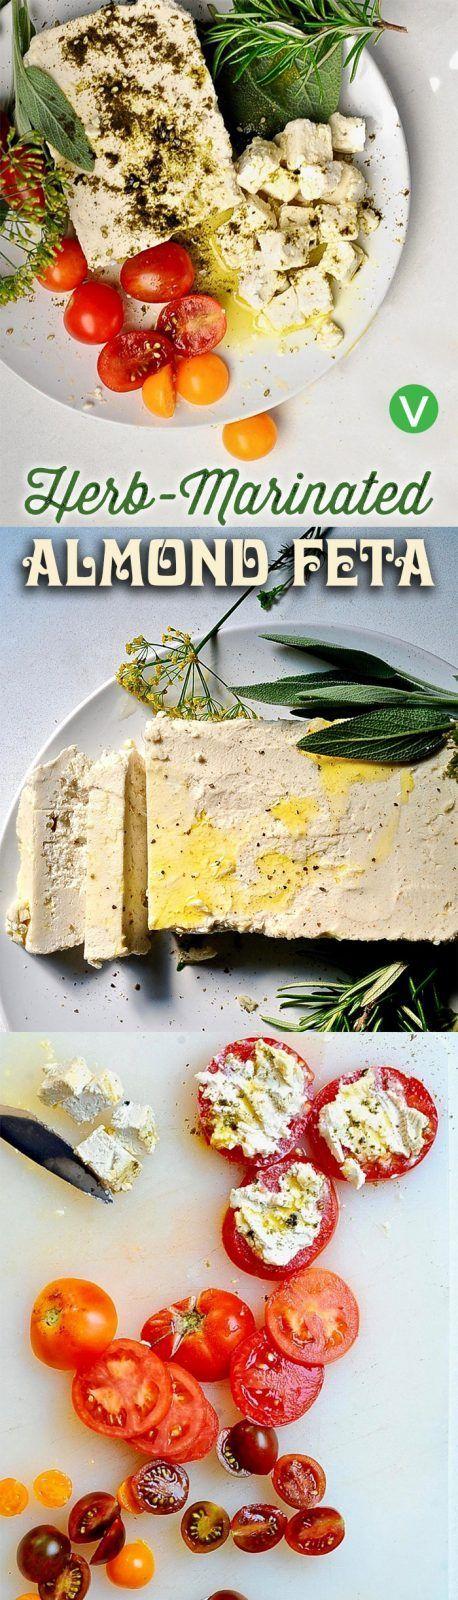 Almond Feta!!!! Vegan cheese. Easy, tangy, creamy delicious, vegan gluten free . #BeingVegan